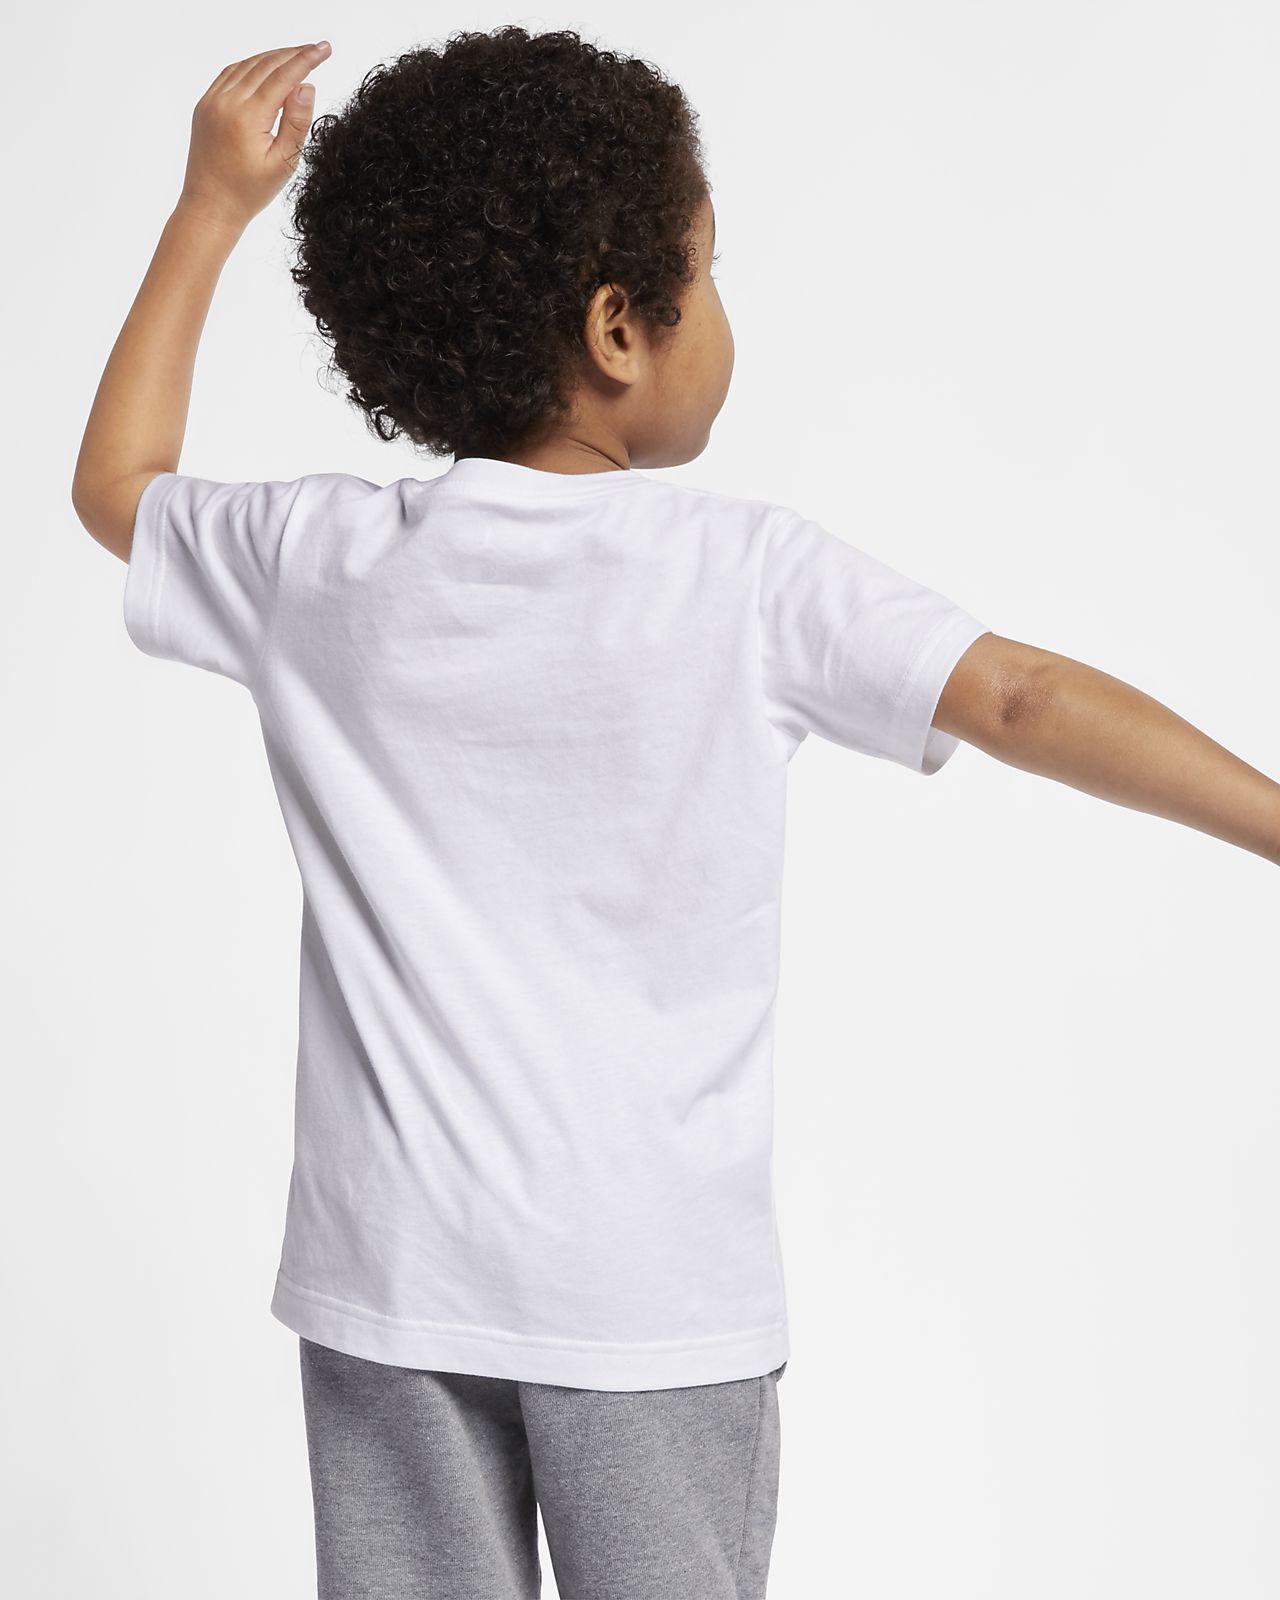 ef9373dd09d Jordan Jumpman Air Younger Kids' T-Shirt. Nike.com GB